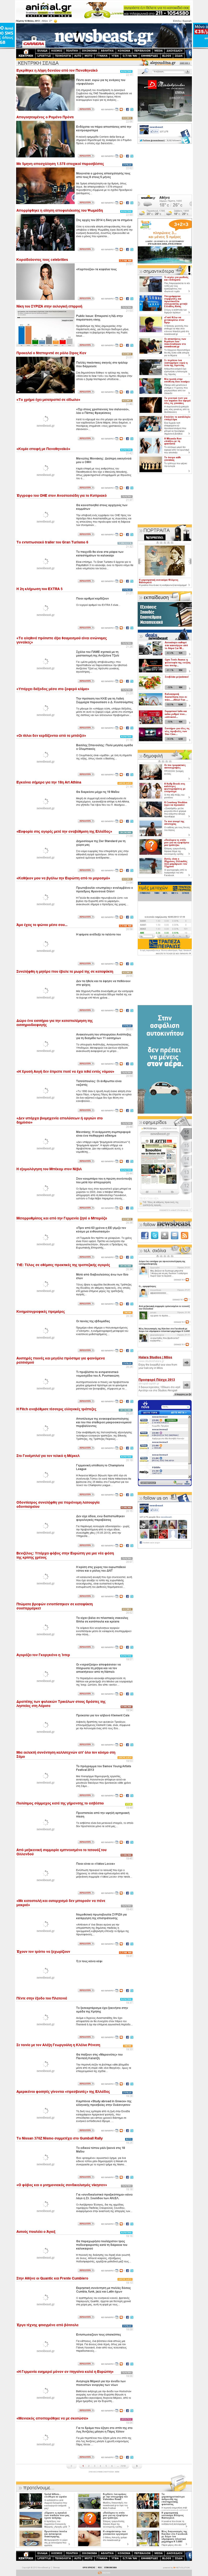 News Beast at Thursday May 16, 2013, 7:14 p.m. UTC